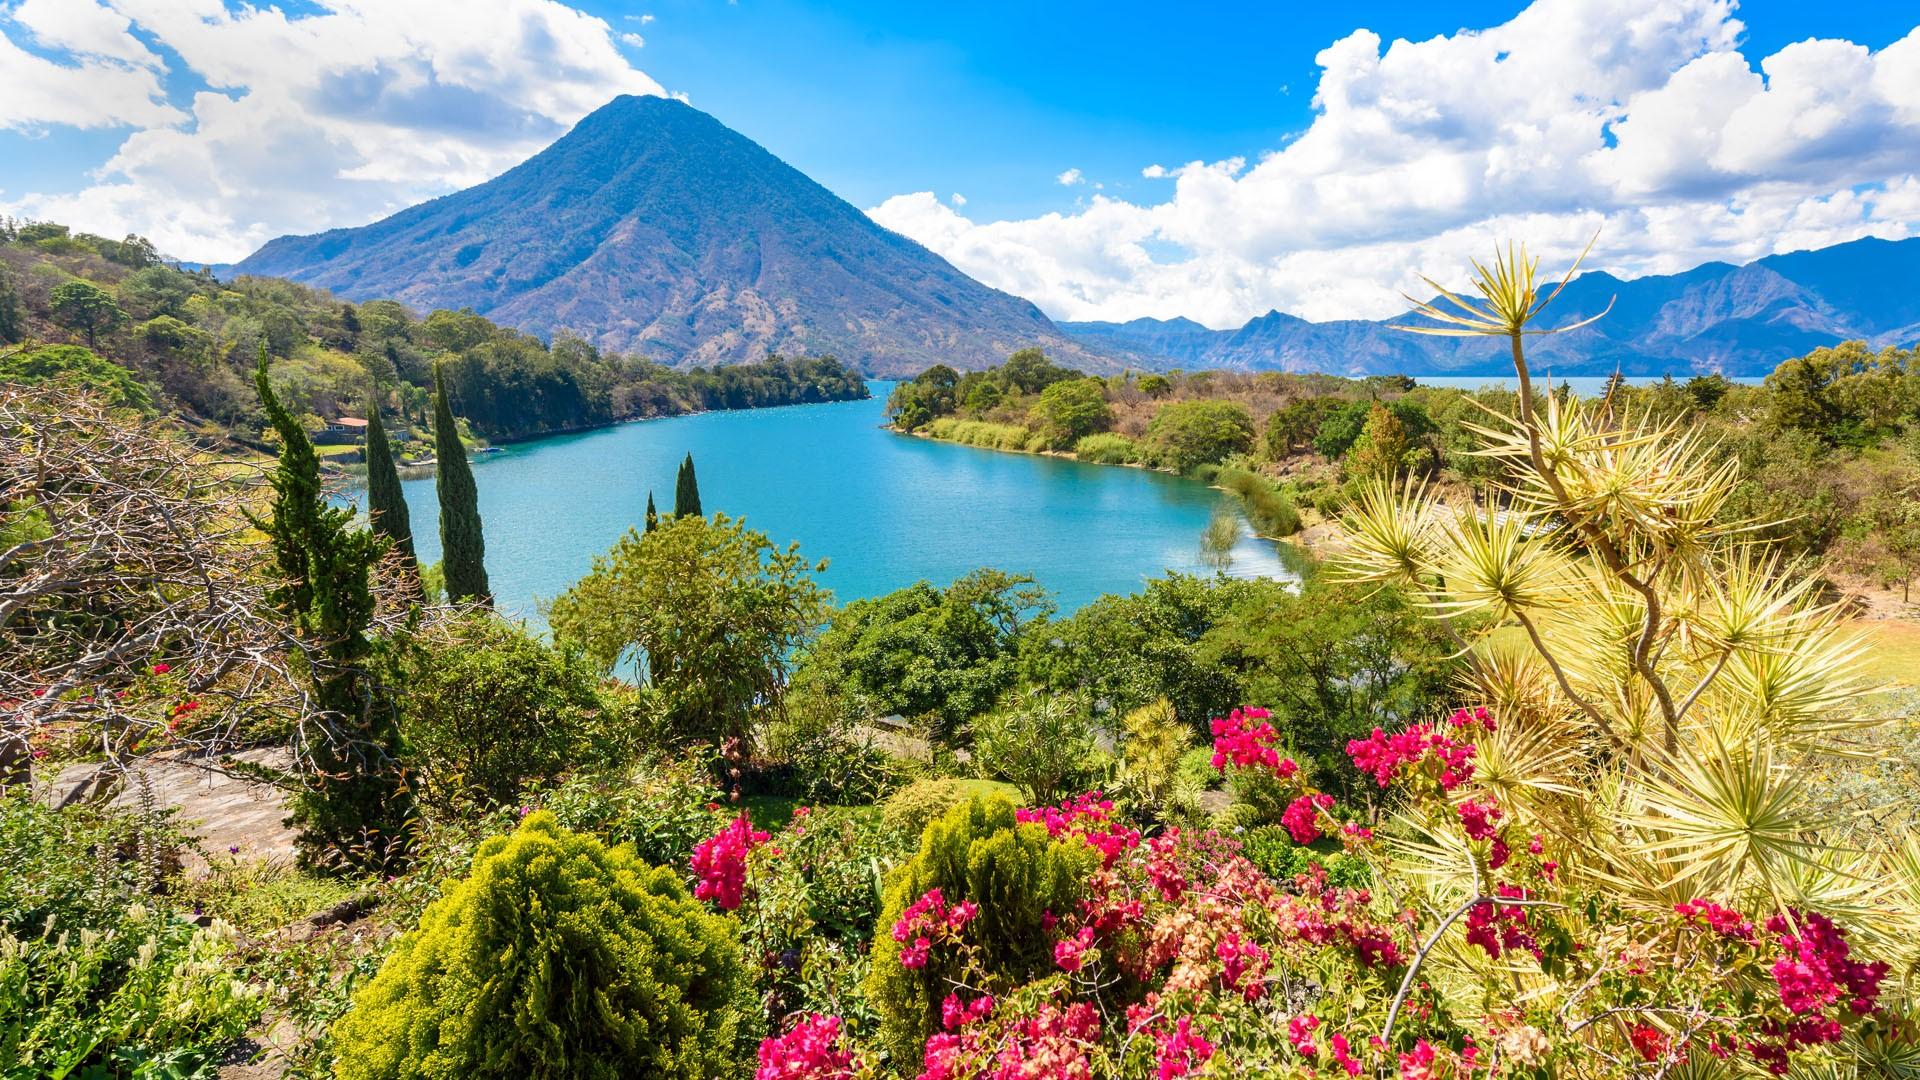 General 1920x1080 nature landscape mountains clouds trees plants flowers lake sky Guatemala Lago de Atitlán Lake Atitlán